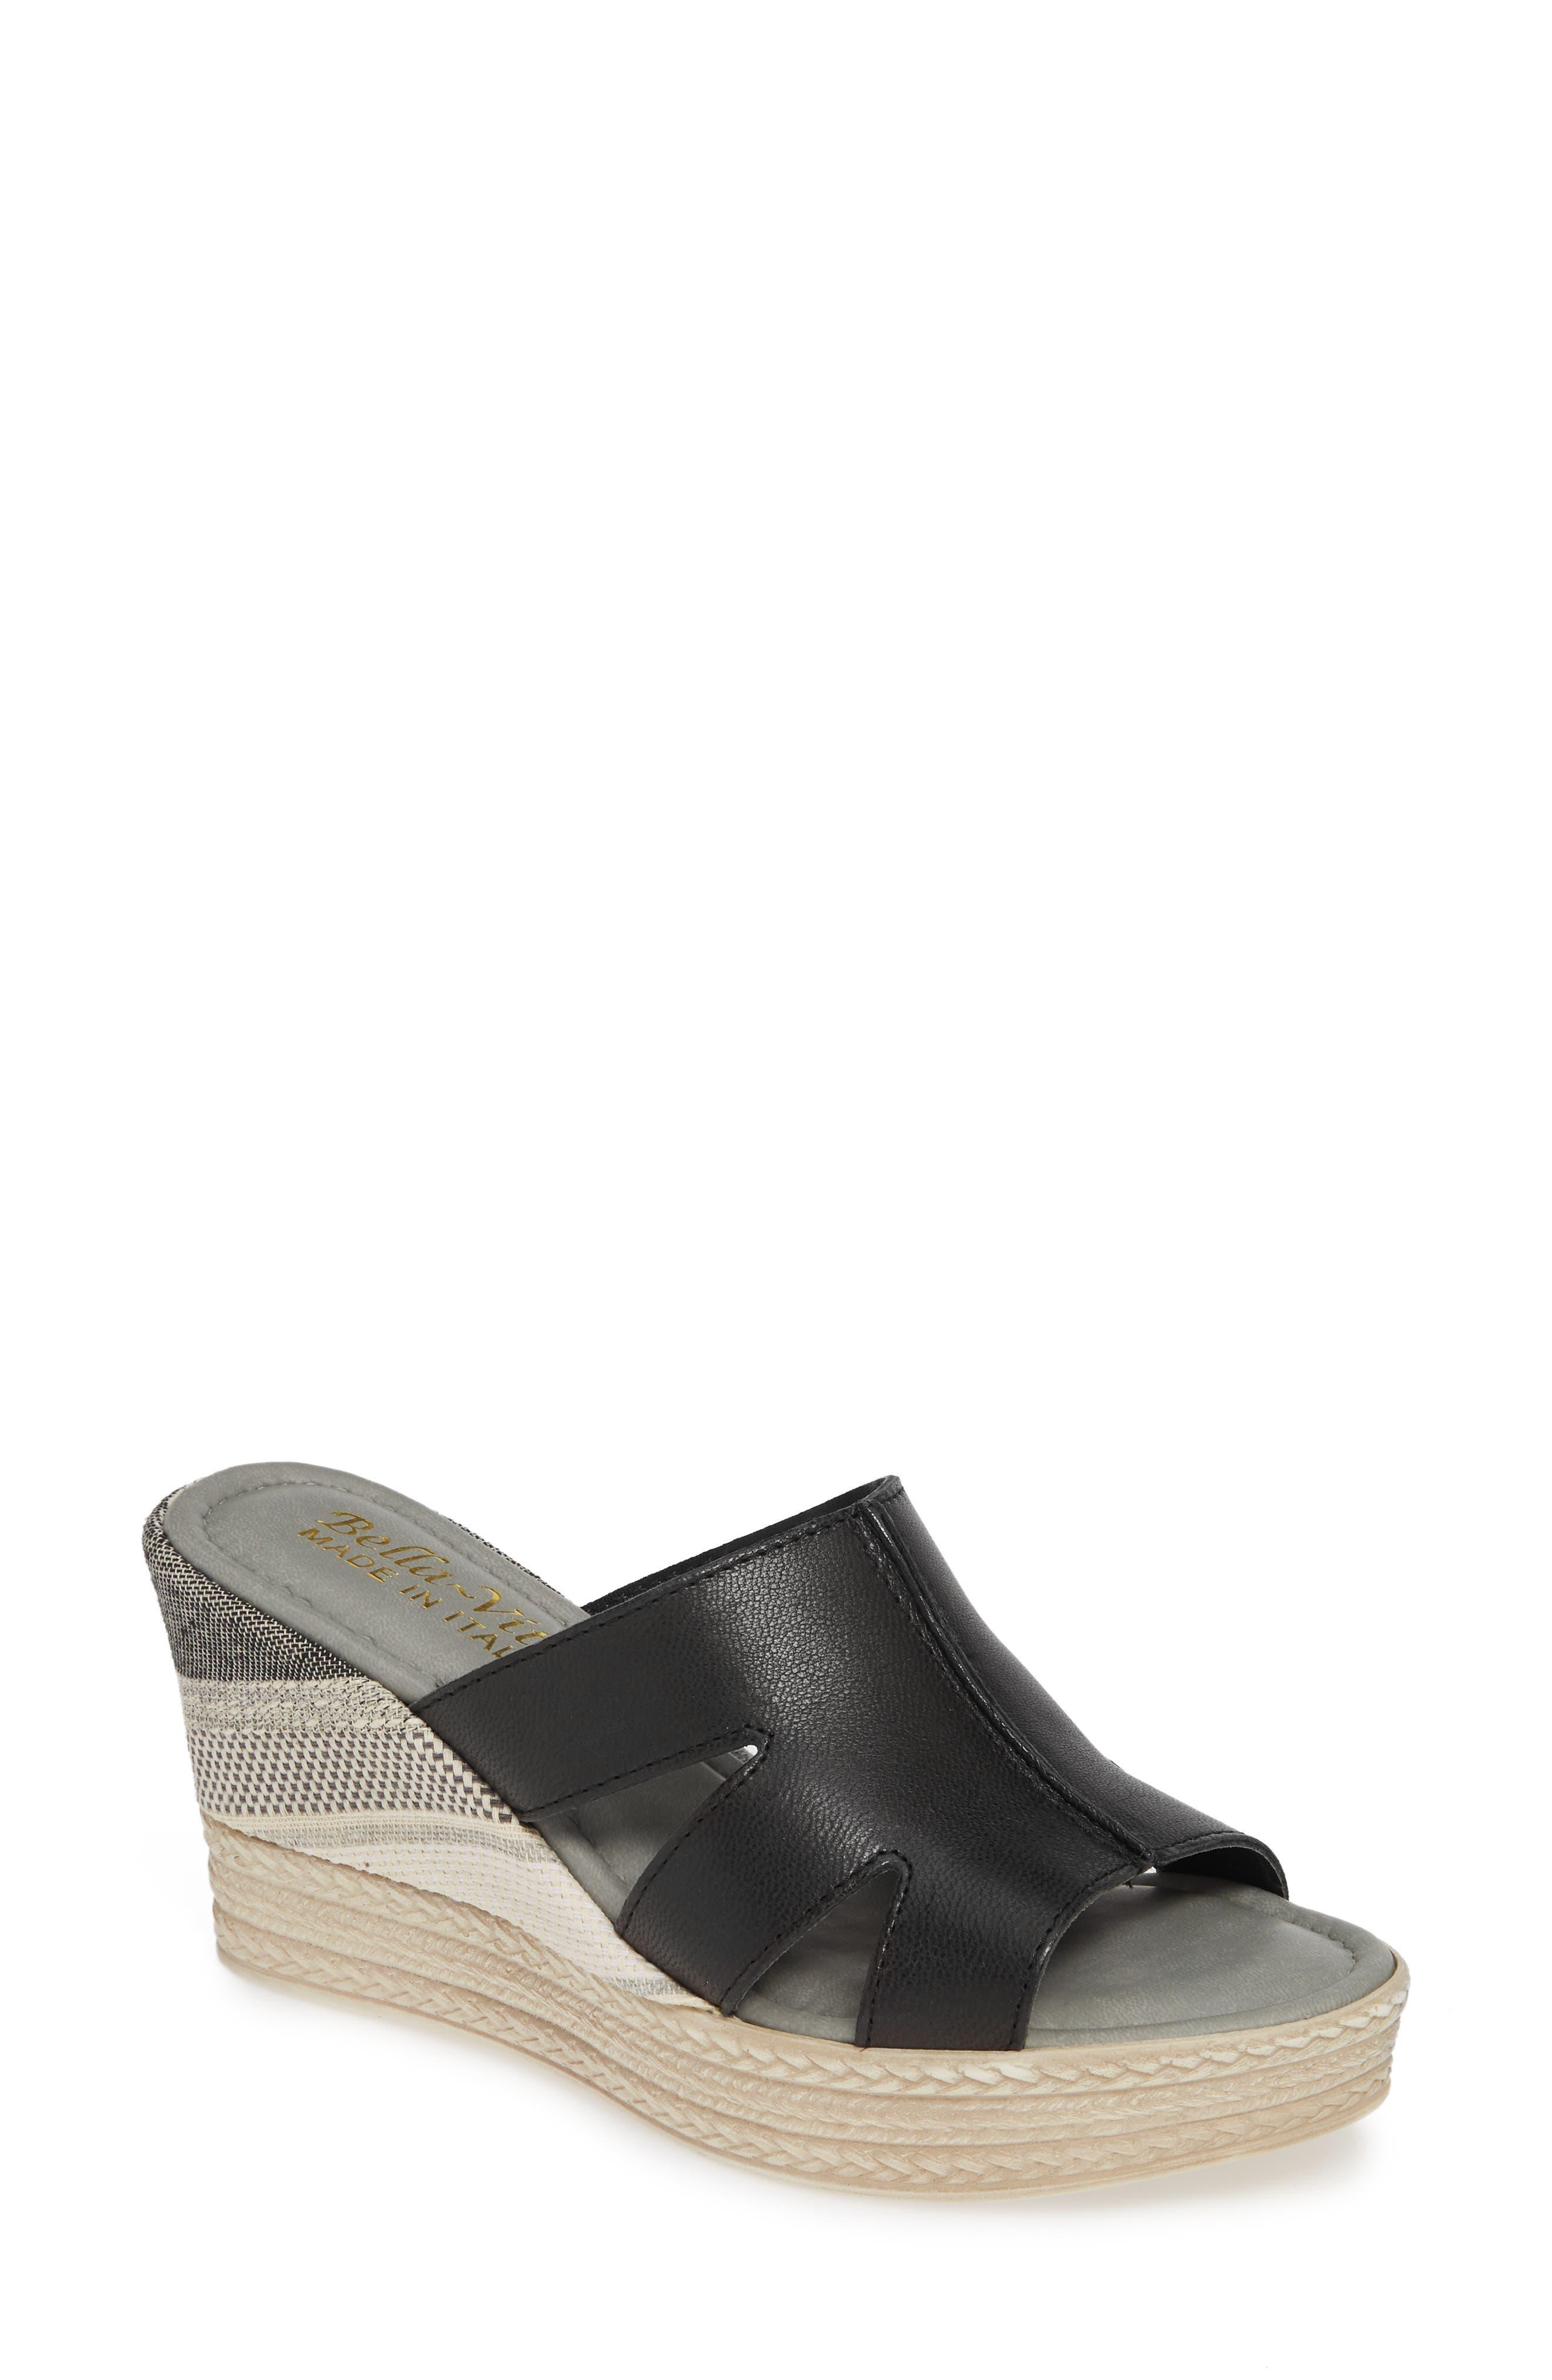 BELLA VITA Rox Wedge Slide Sandal, Main, color, BLACK ITALIAN LEATHER